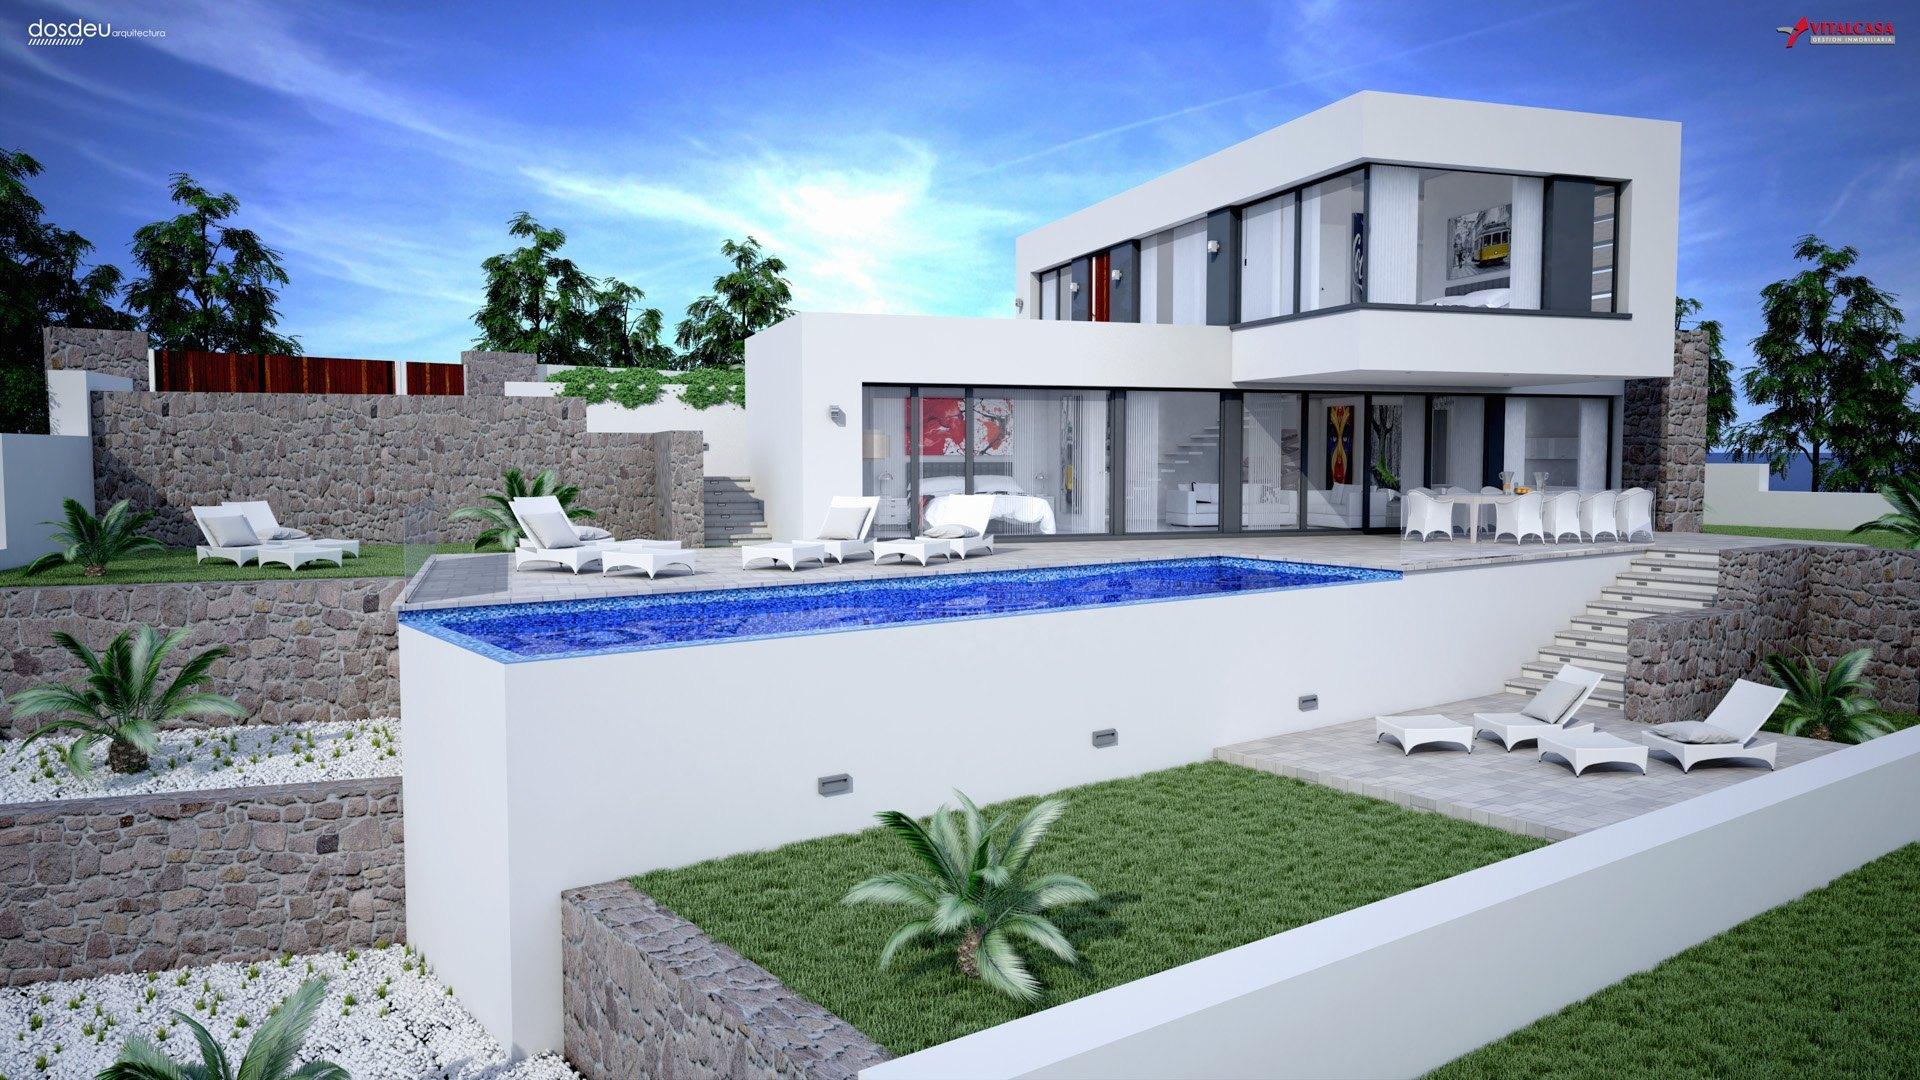 vitalcasa-propiedades_5734359da4338-source